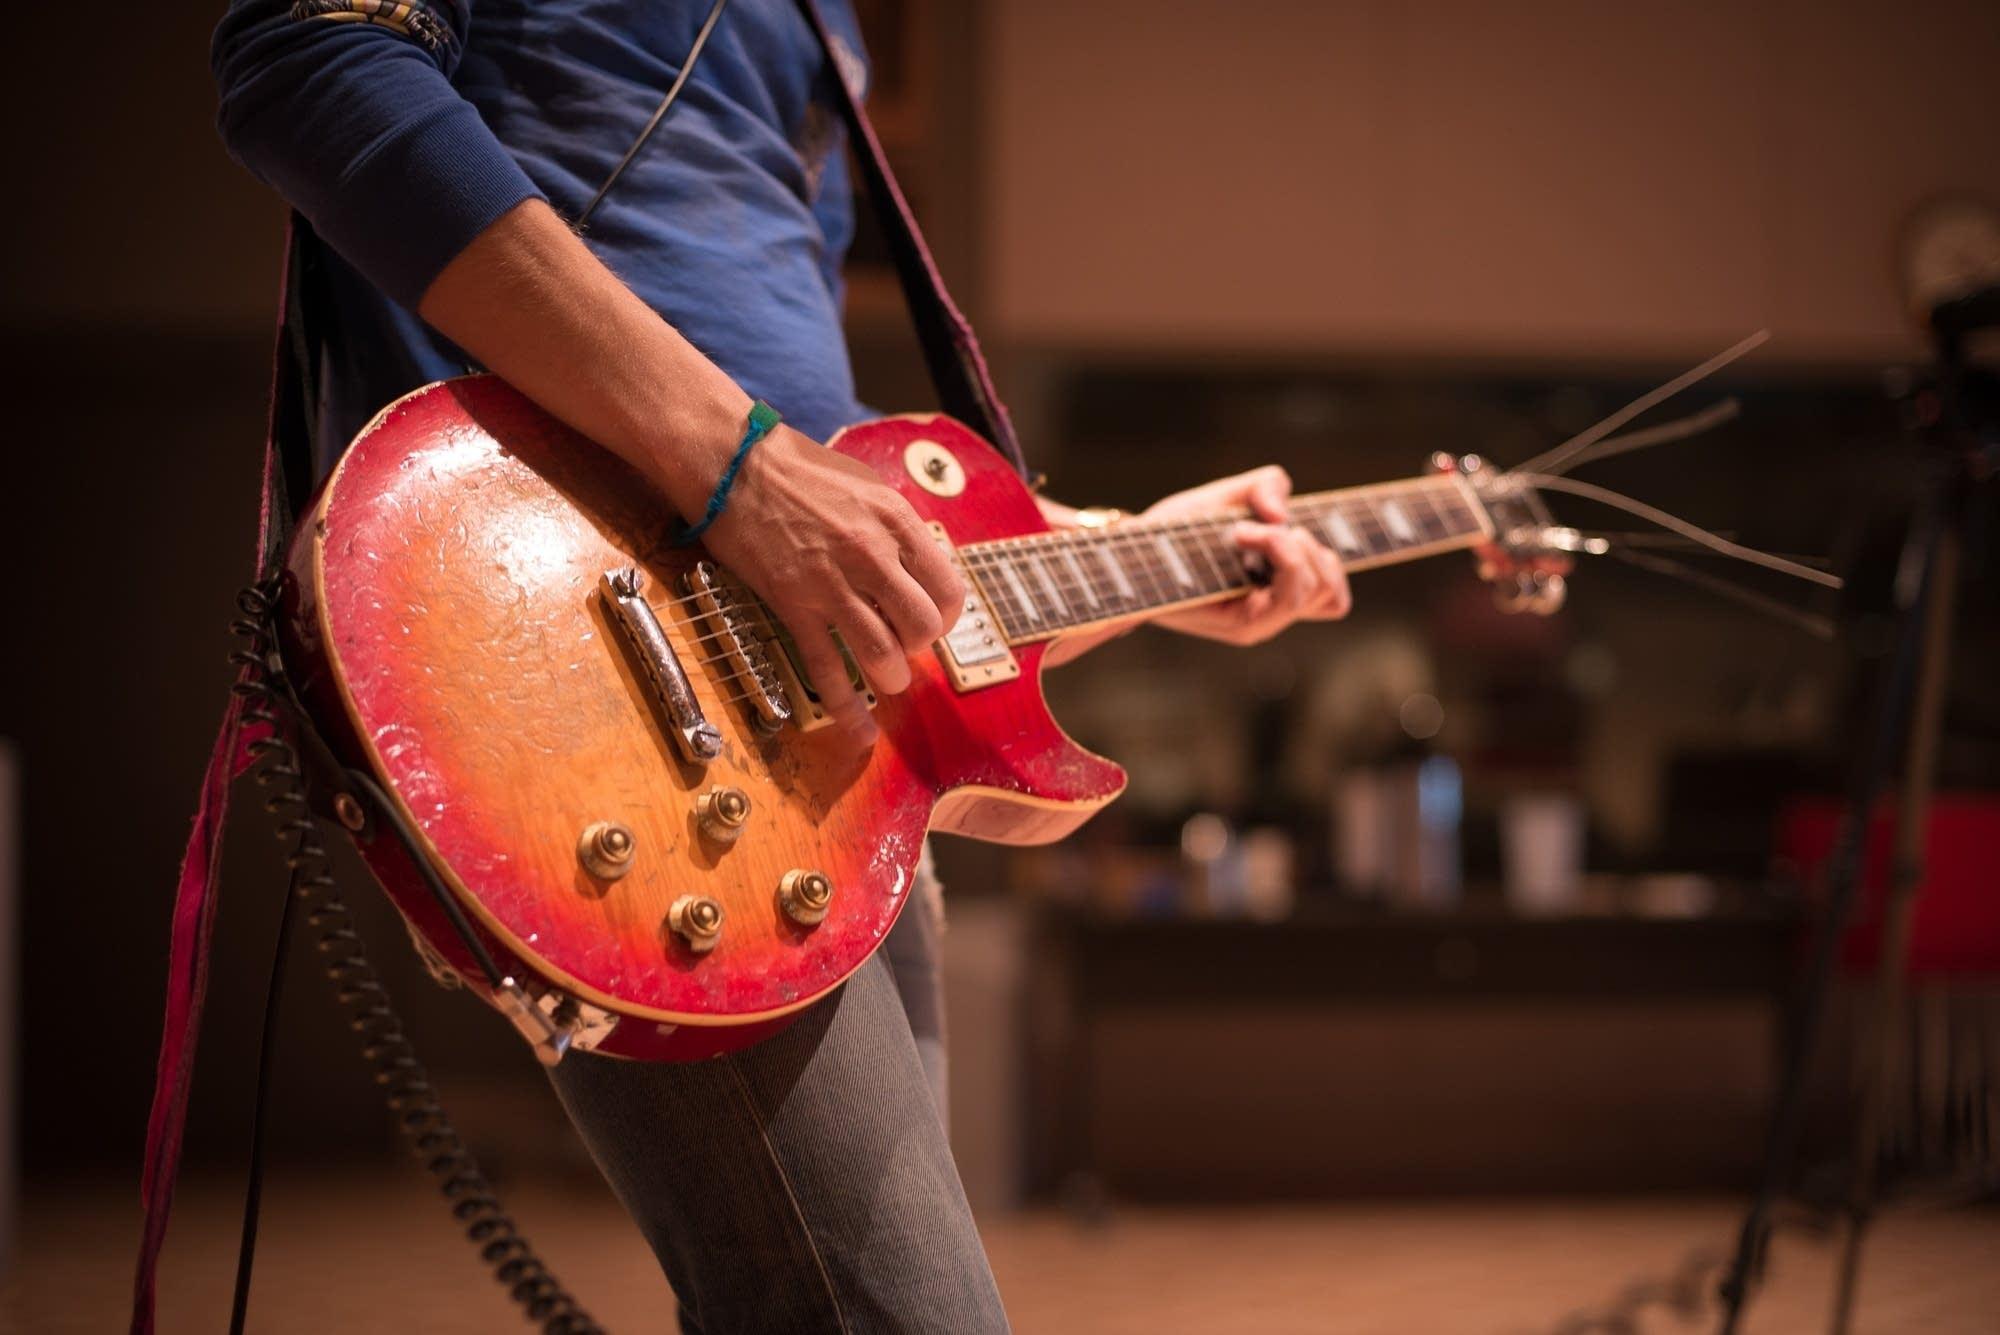 Wells' guitar